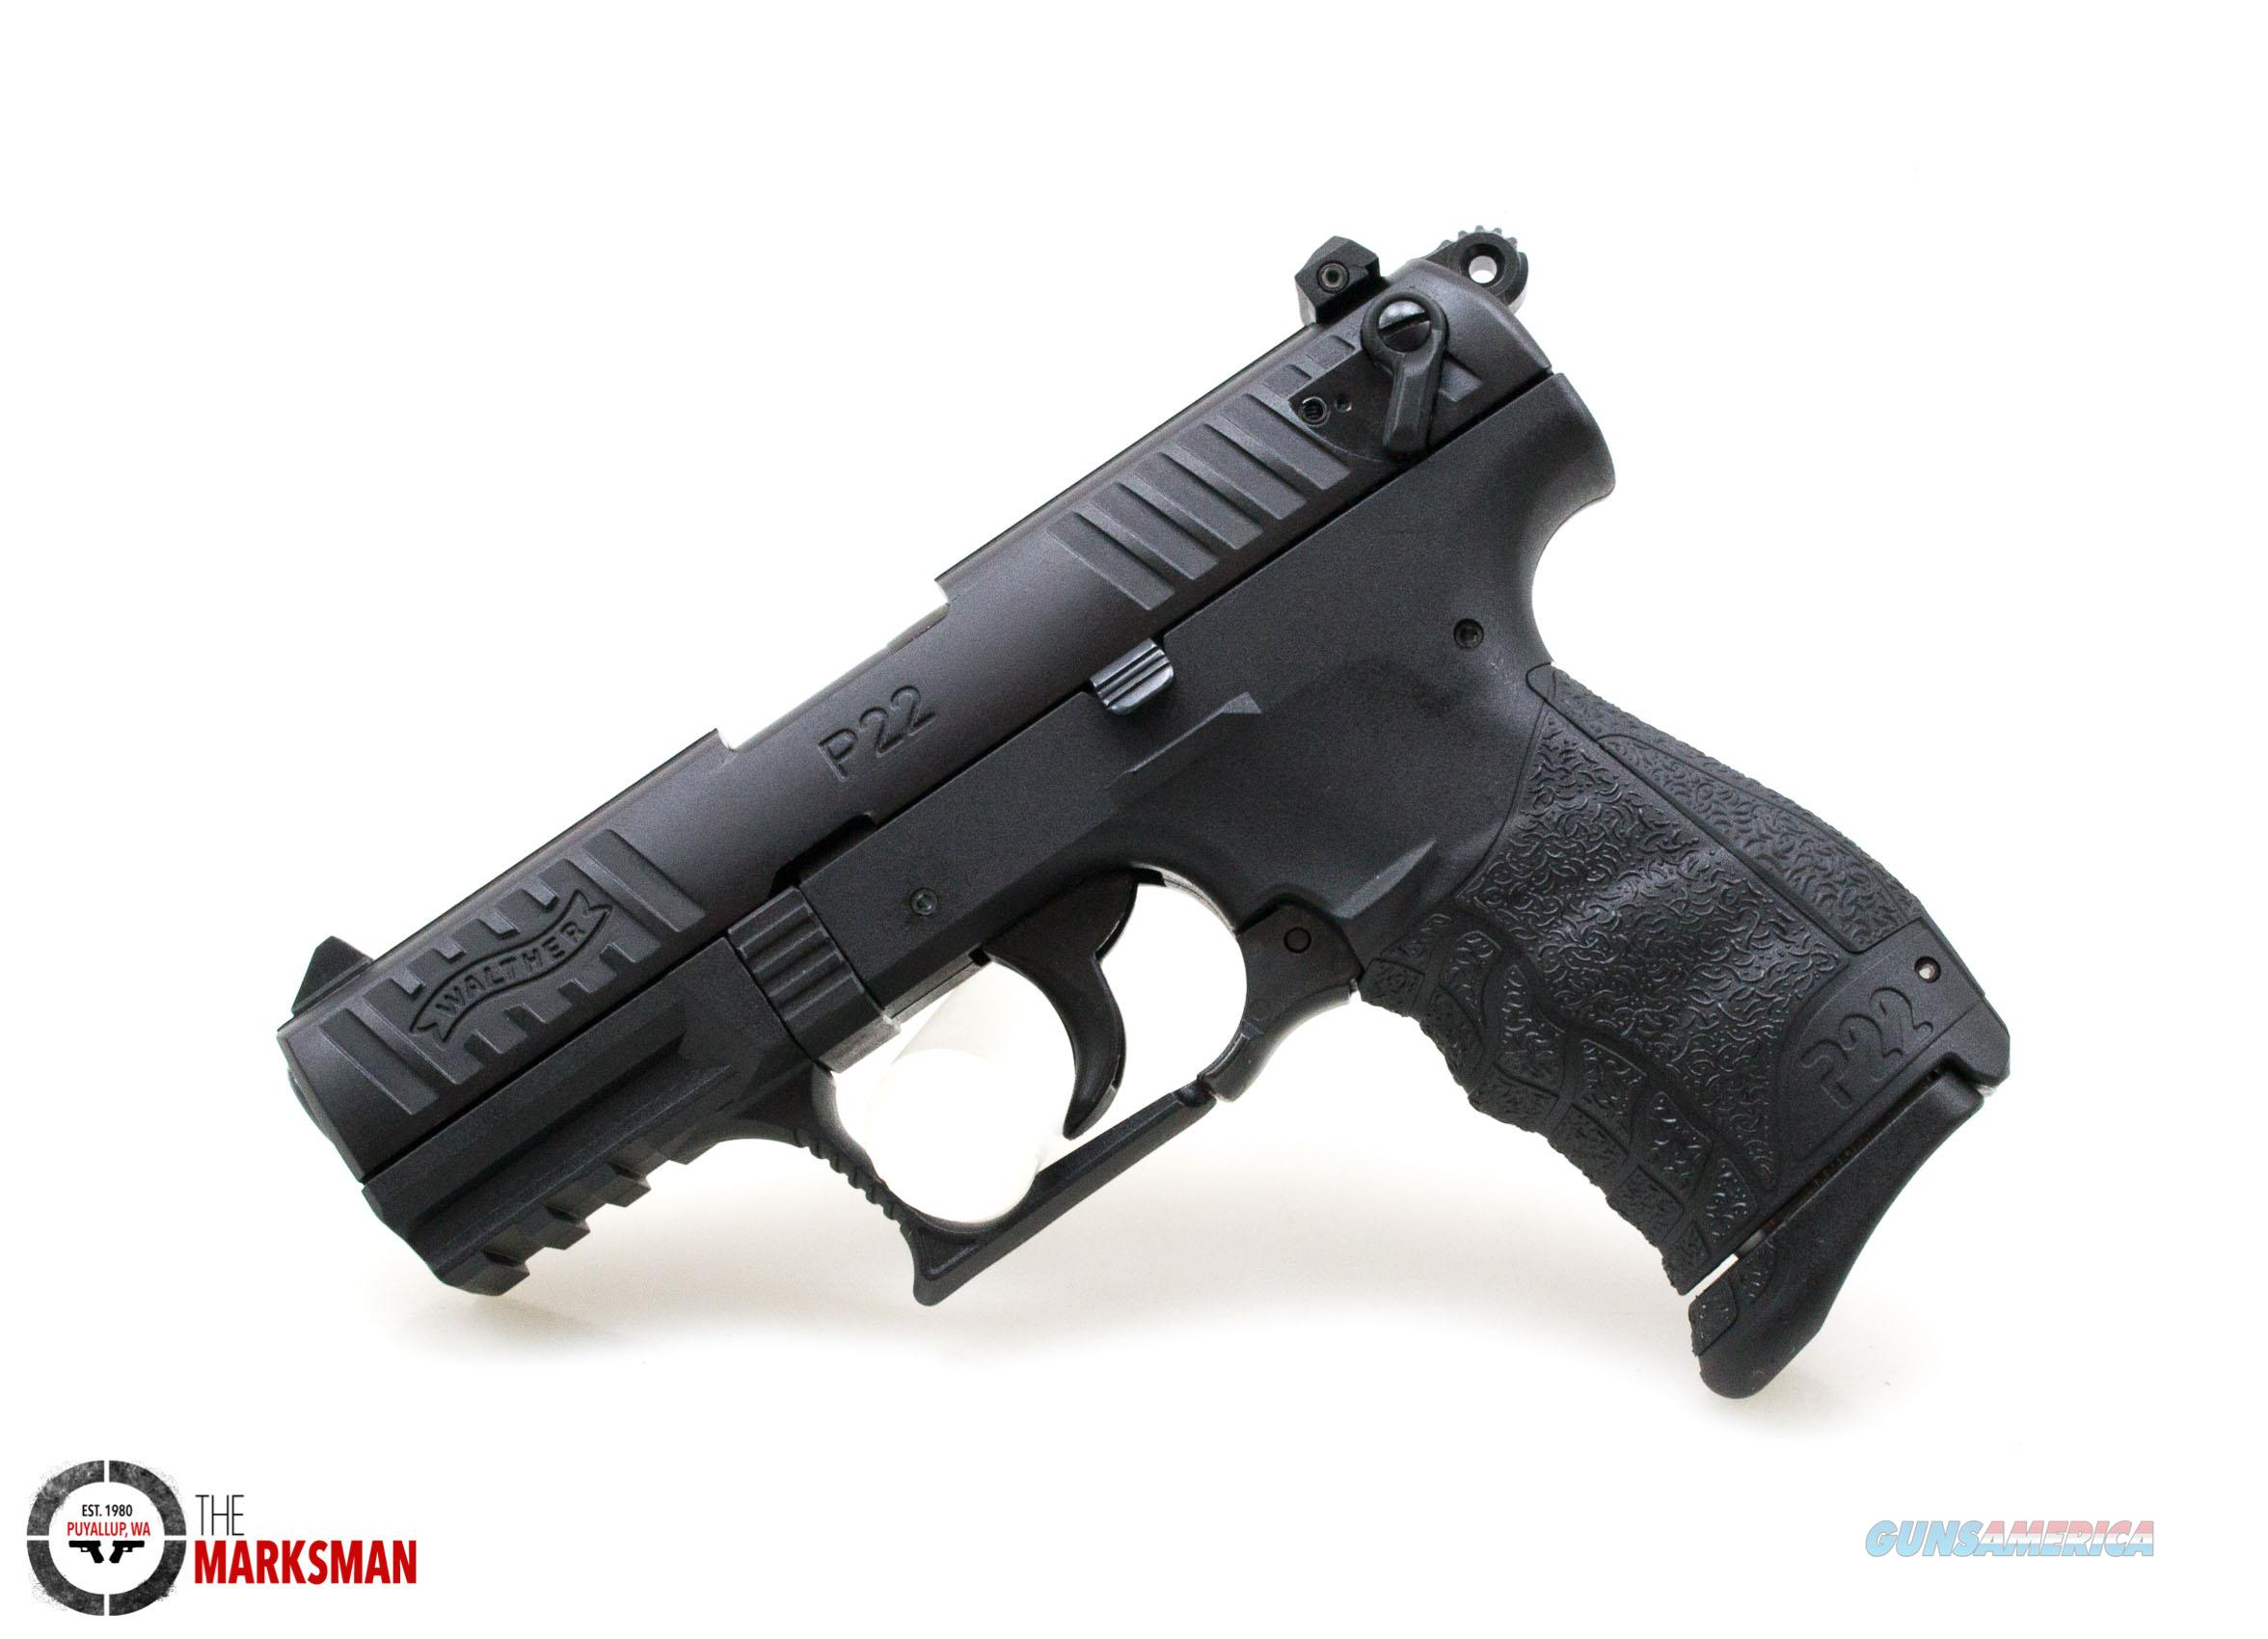 Walther P22 QD, .22 lr NEW 5120500  Guns > Pistols > Walther Pistols > Post WWII > P22